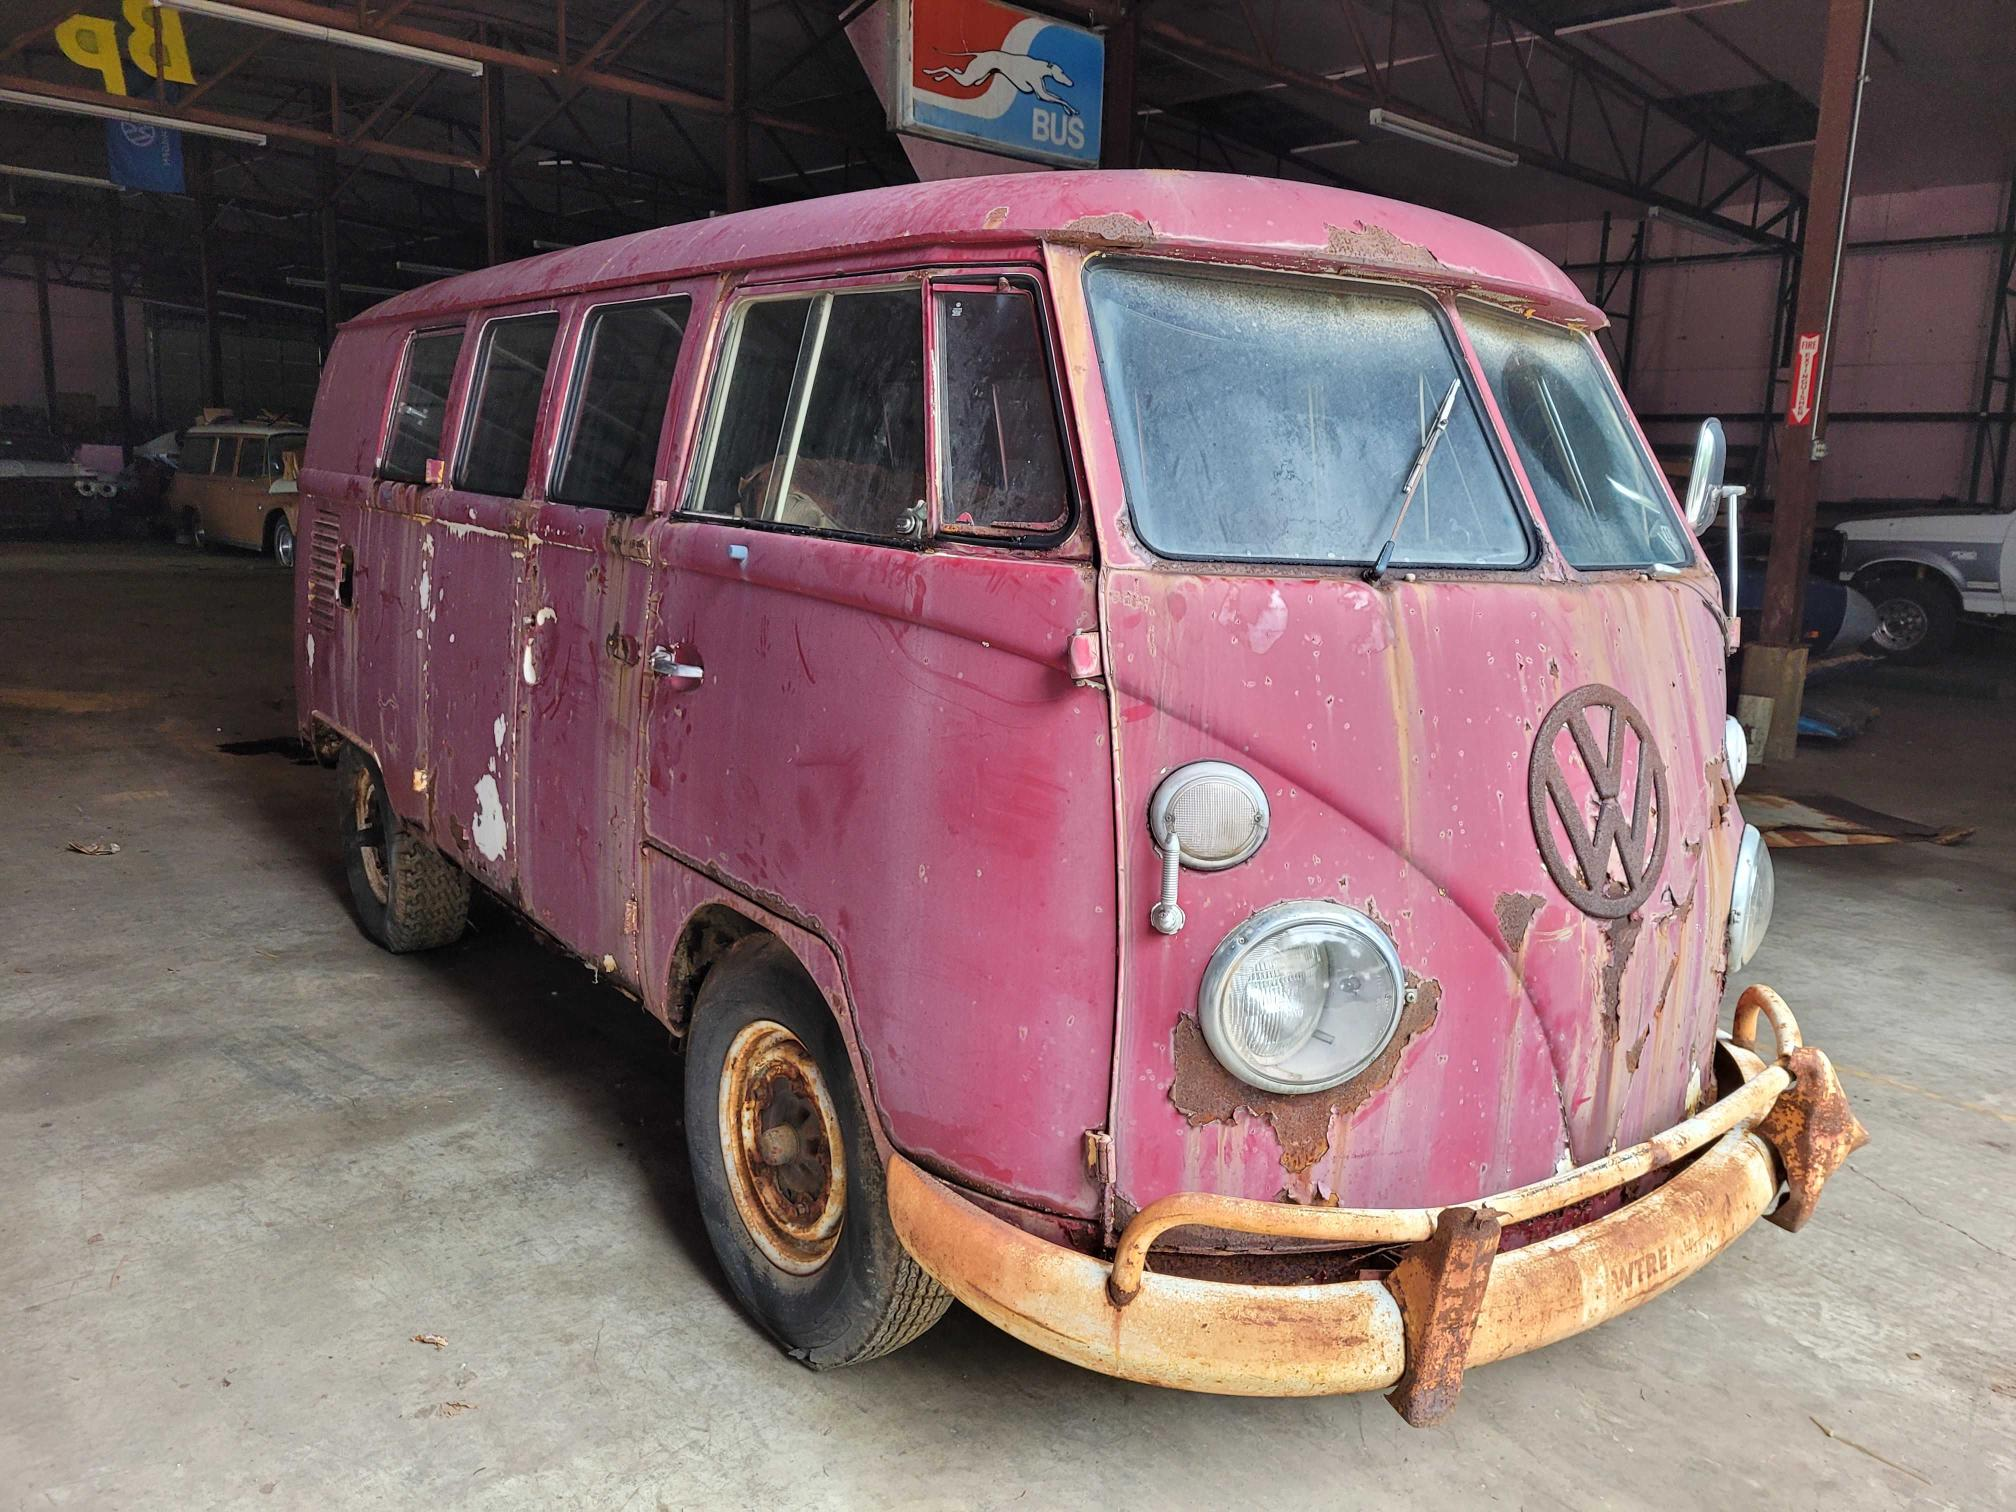 1966 Volkswagen Bus for sale in Lebanon, TN